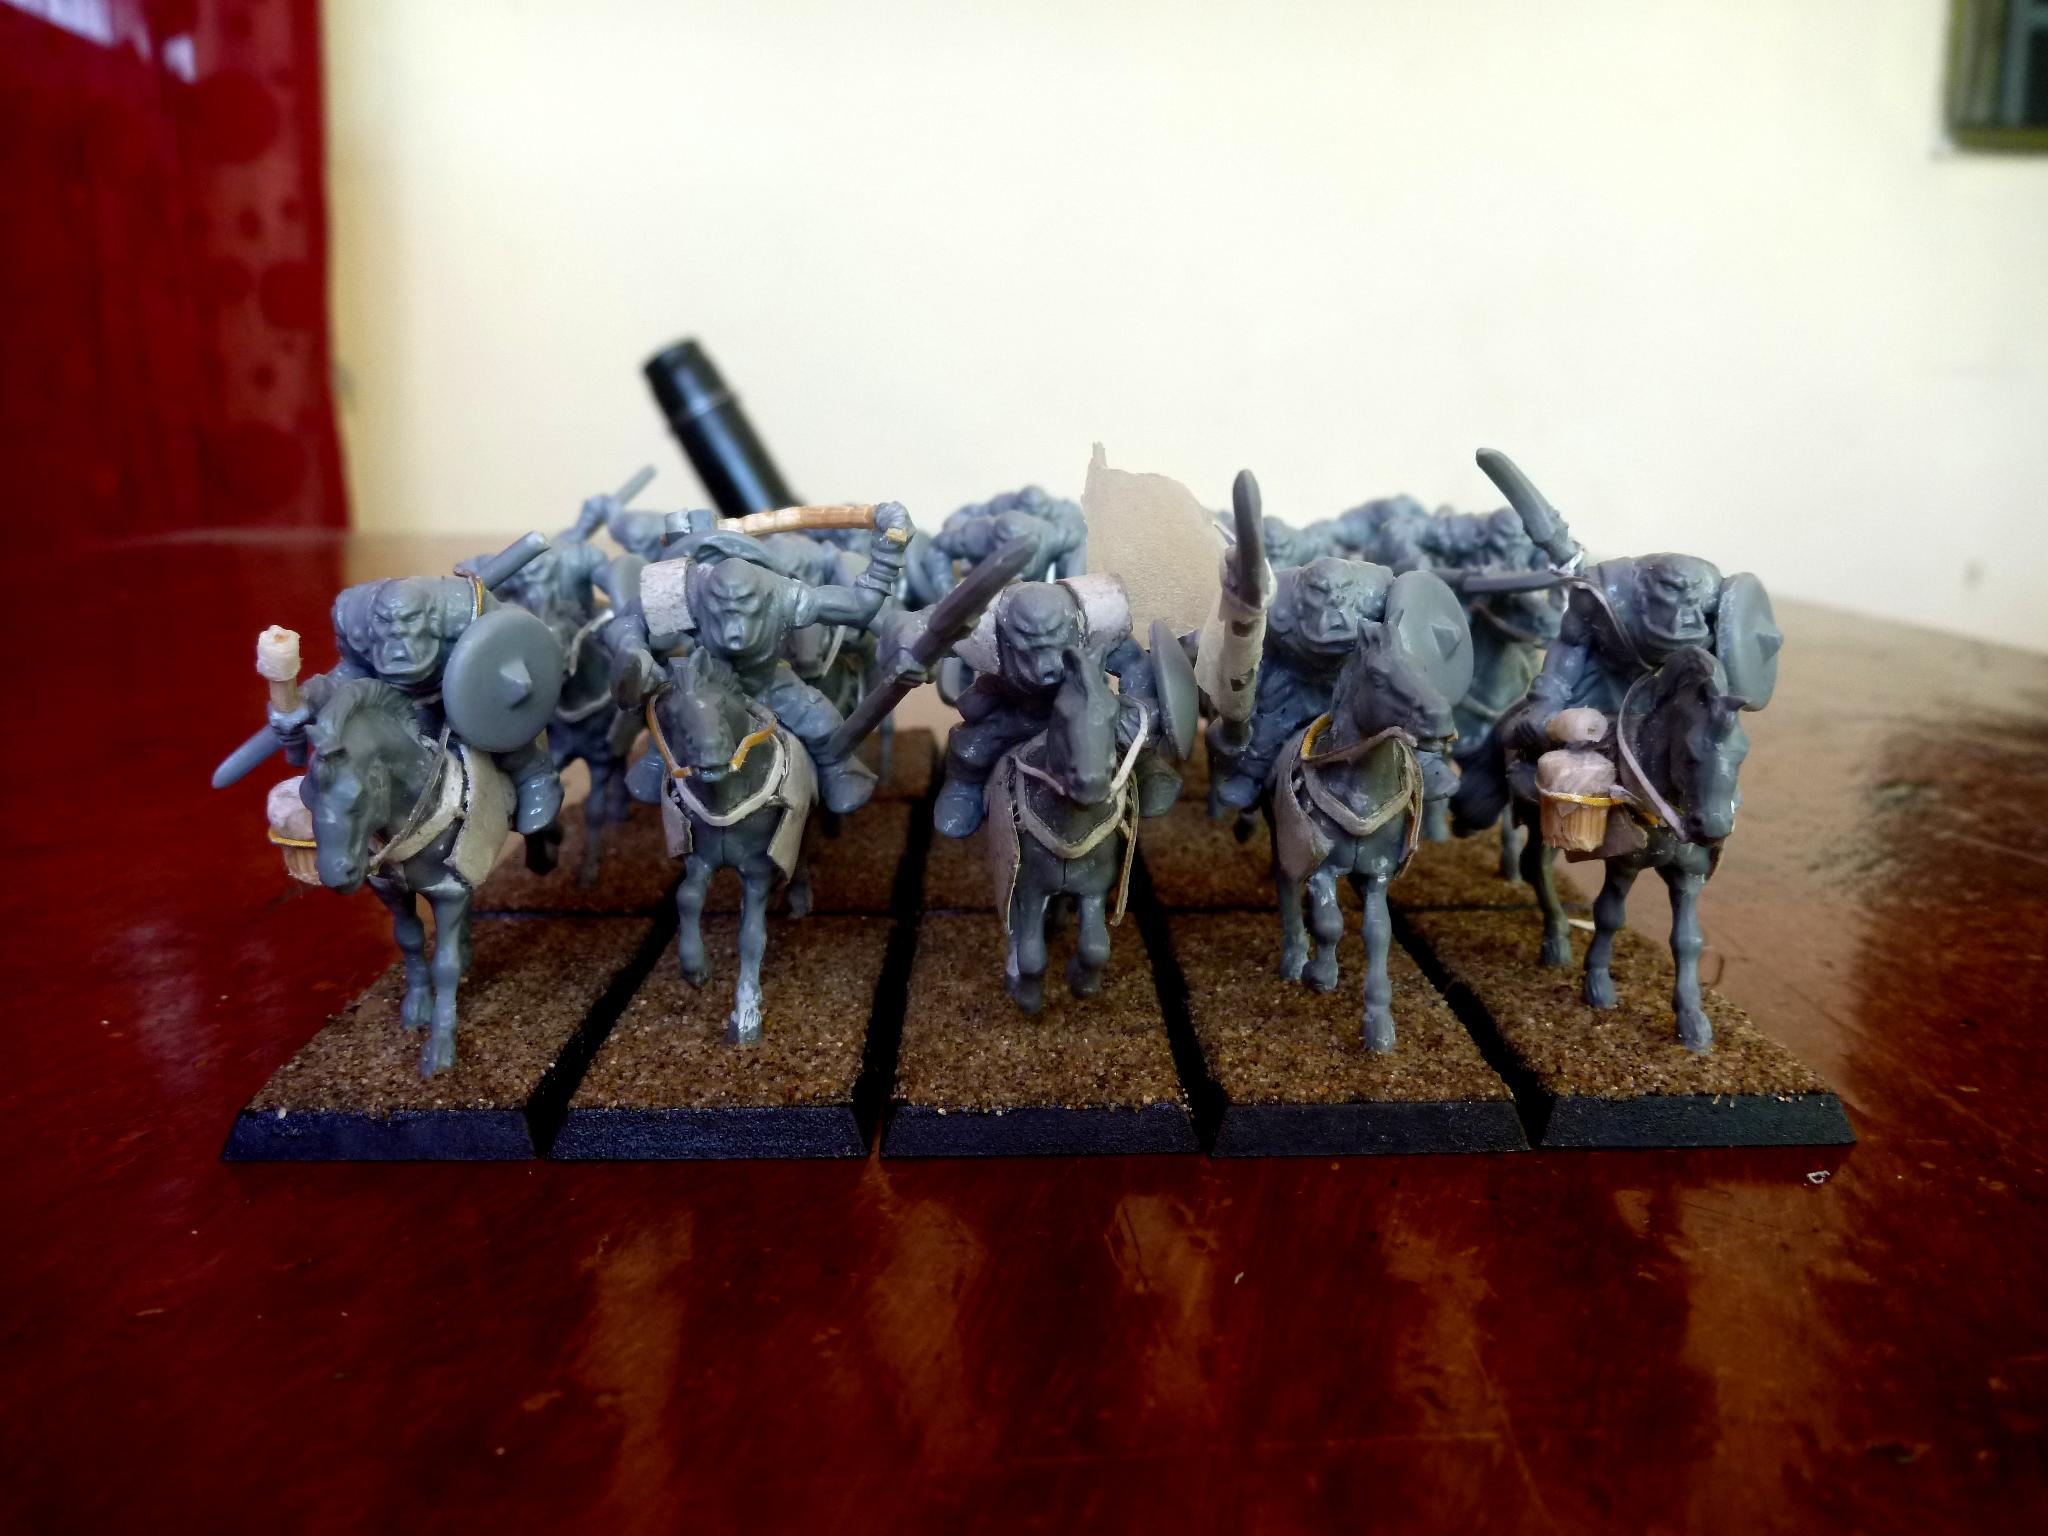 Cavalry, Conversion, Em4, Horse, Orcs, Orks, Wargames Factory